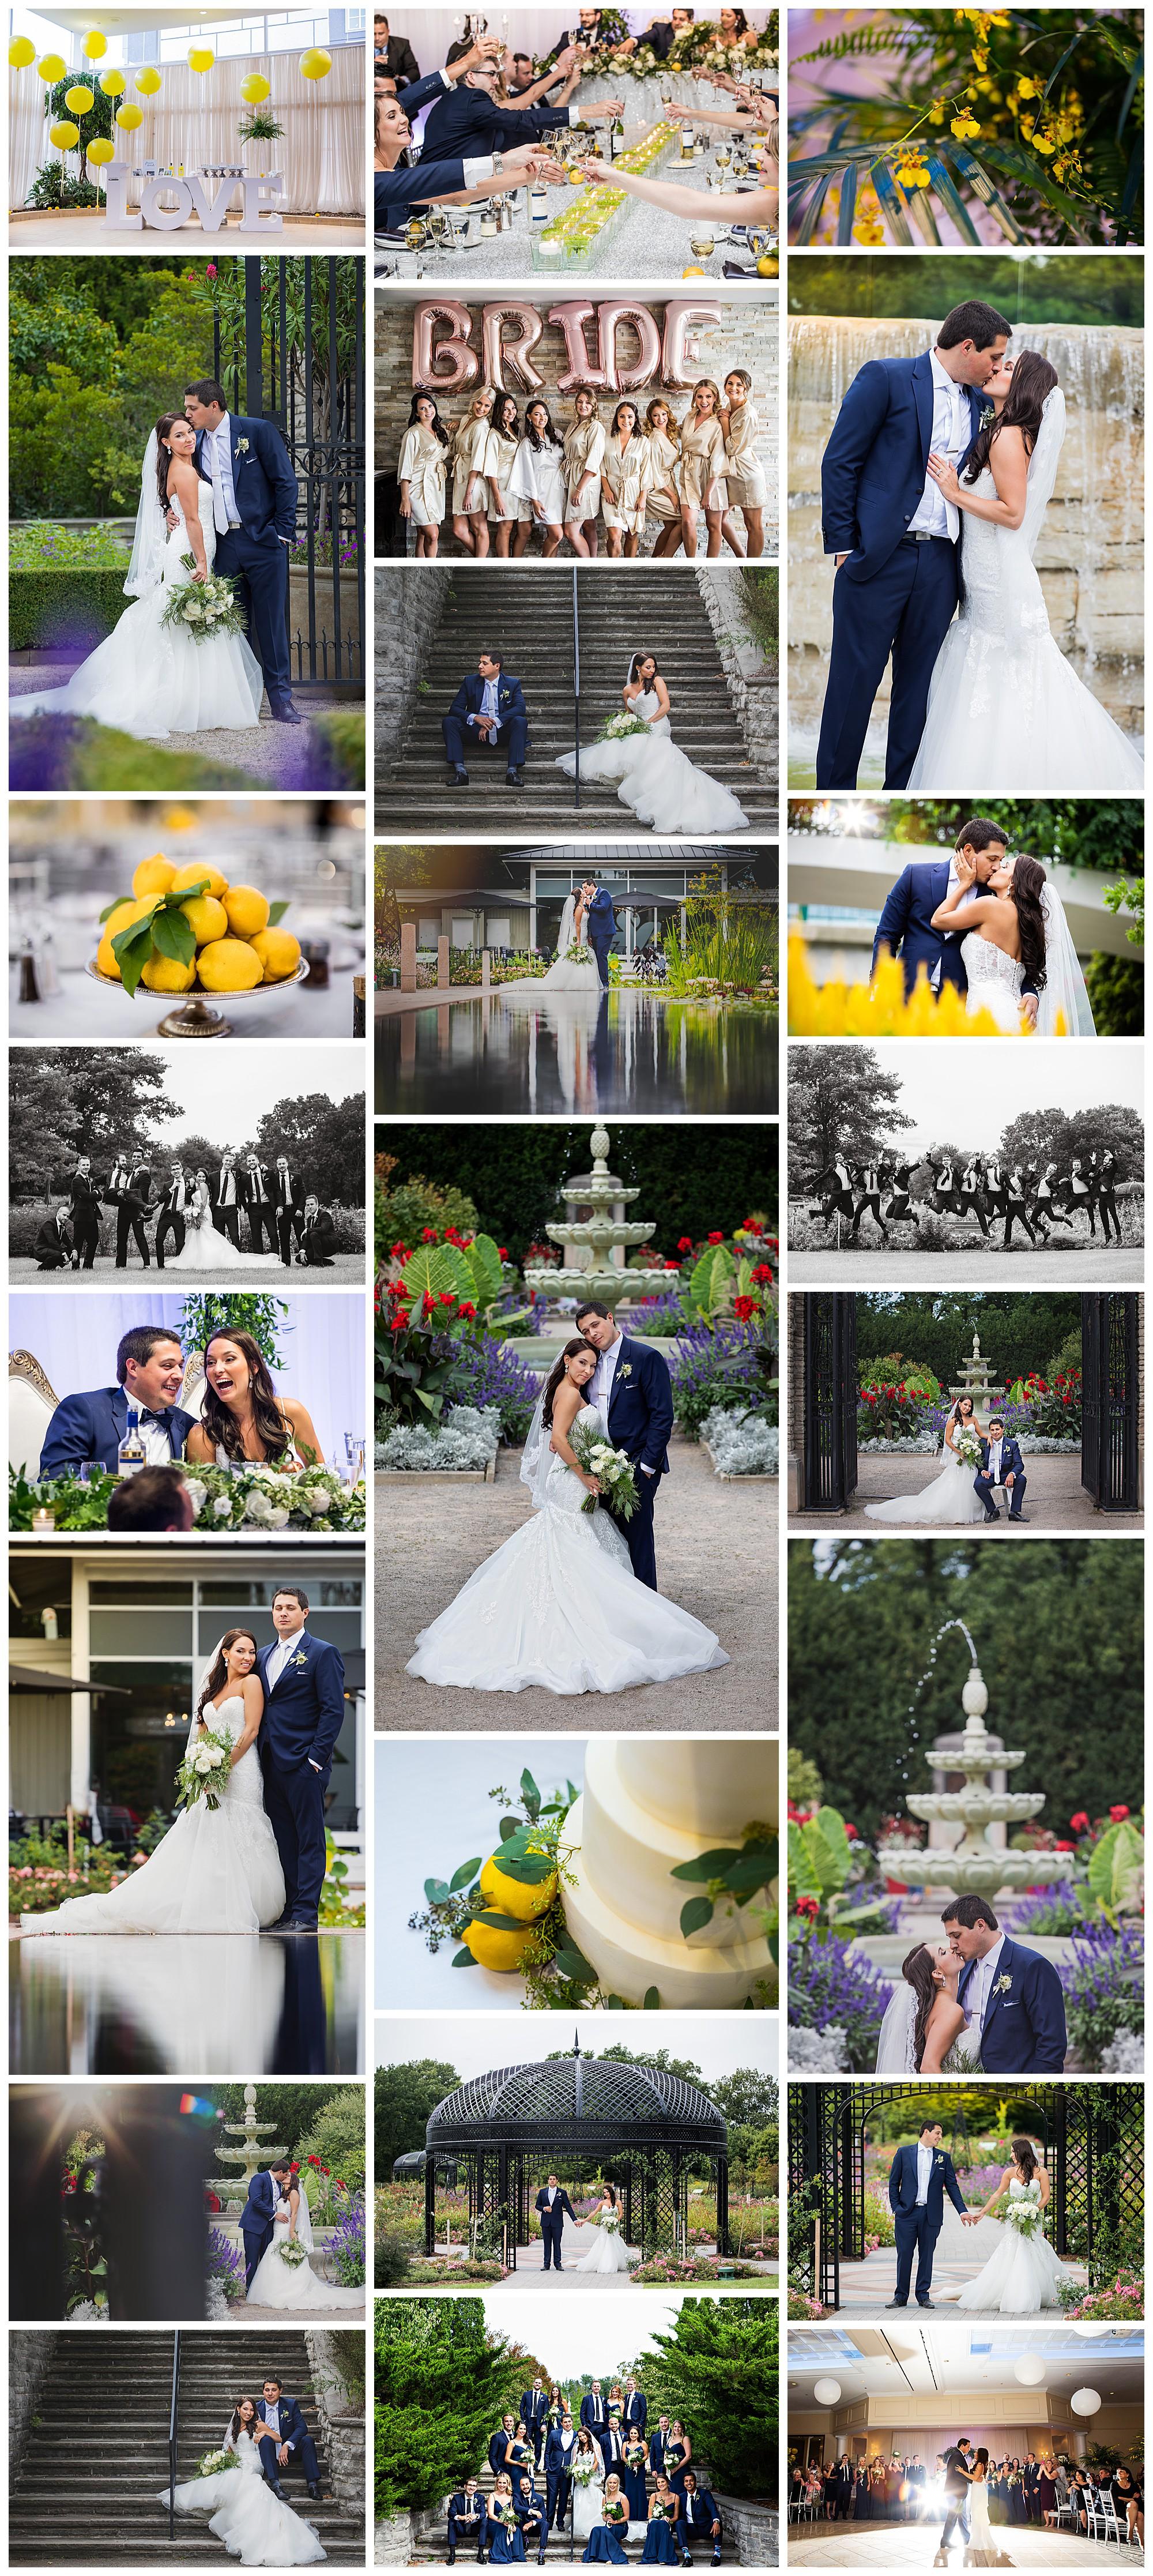 Burlington Convention Centre, Burlington, Ontario wedding photography by VanDaele & Russell